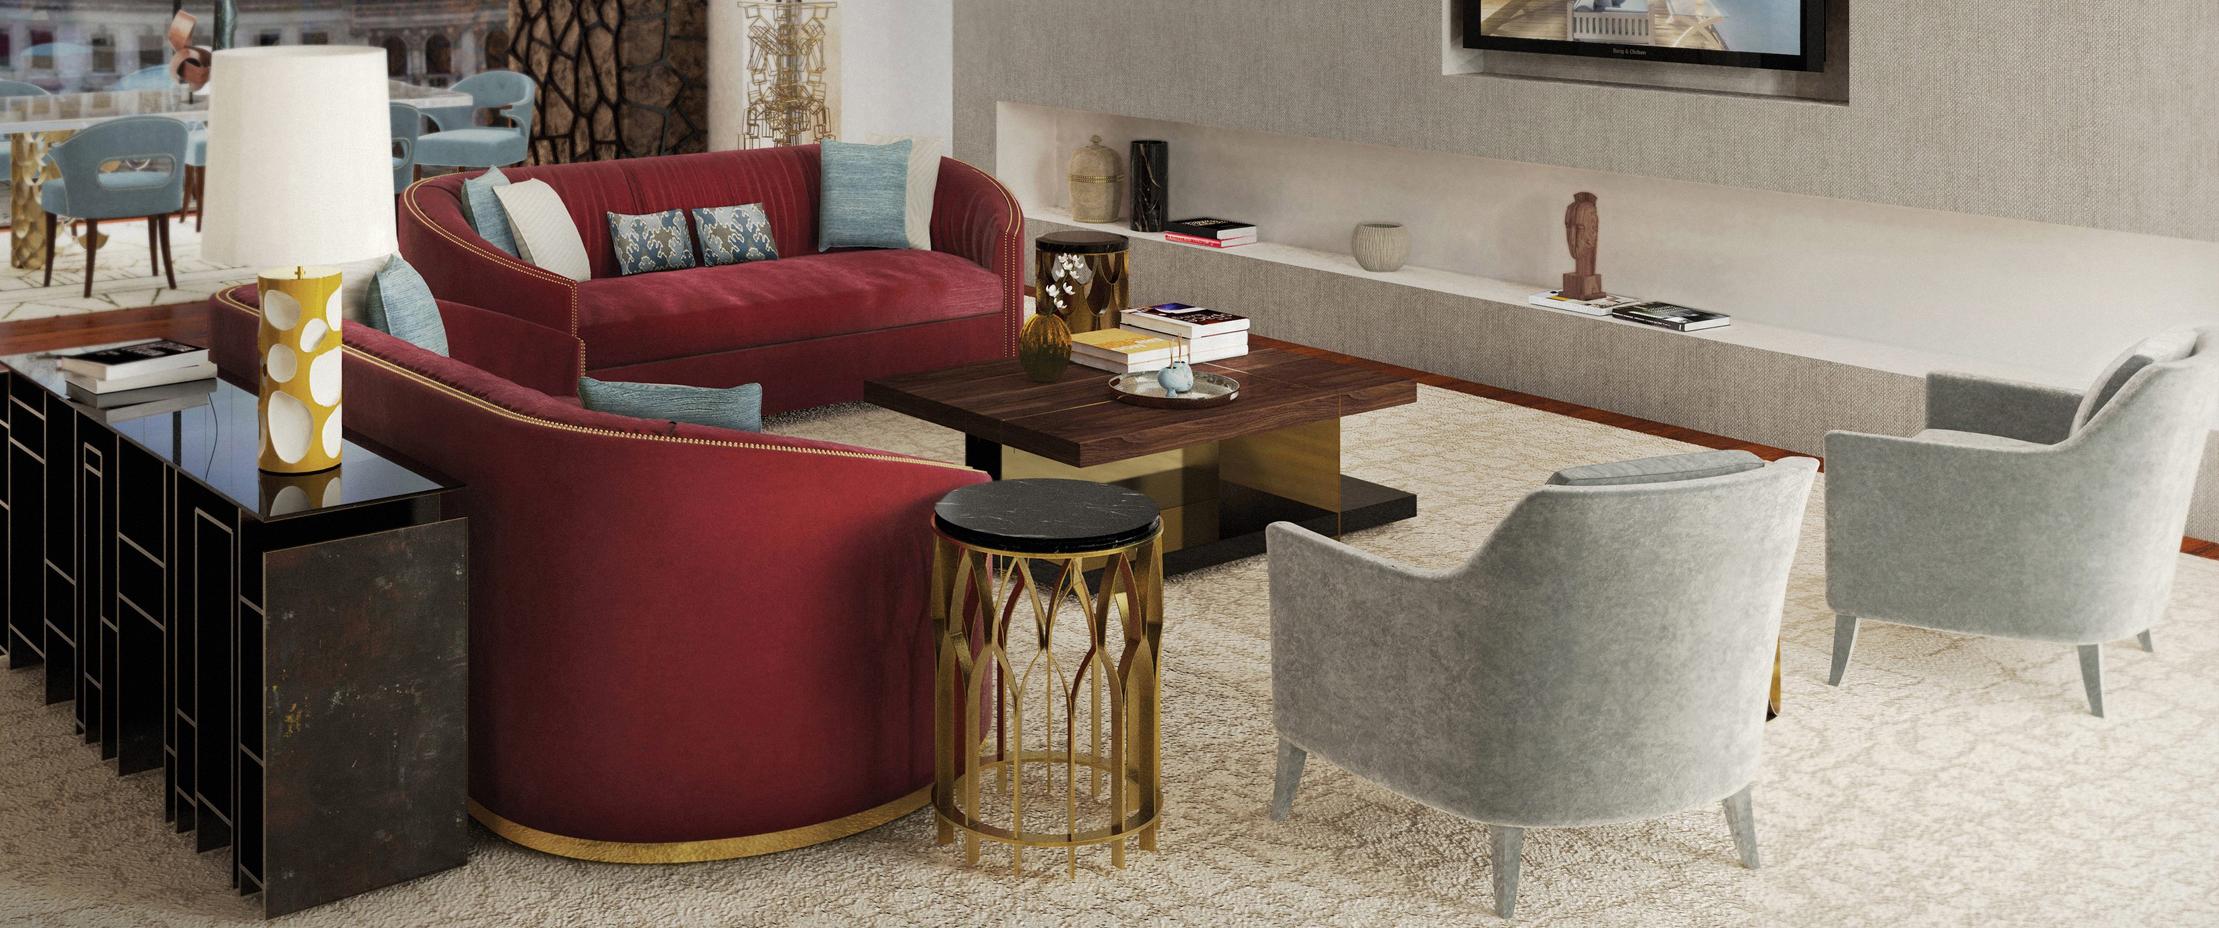 Insplosion-living-room-furniture-by-Brabbu